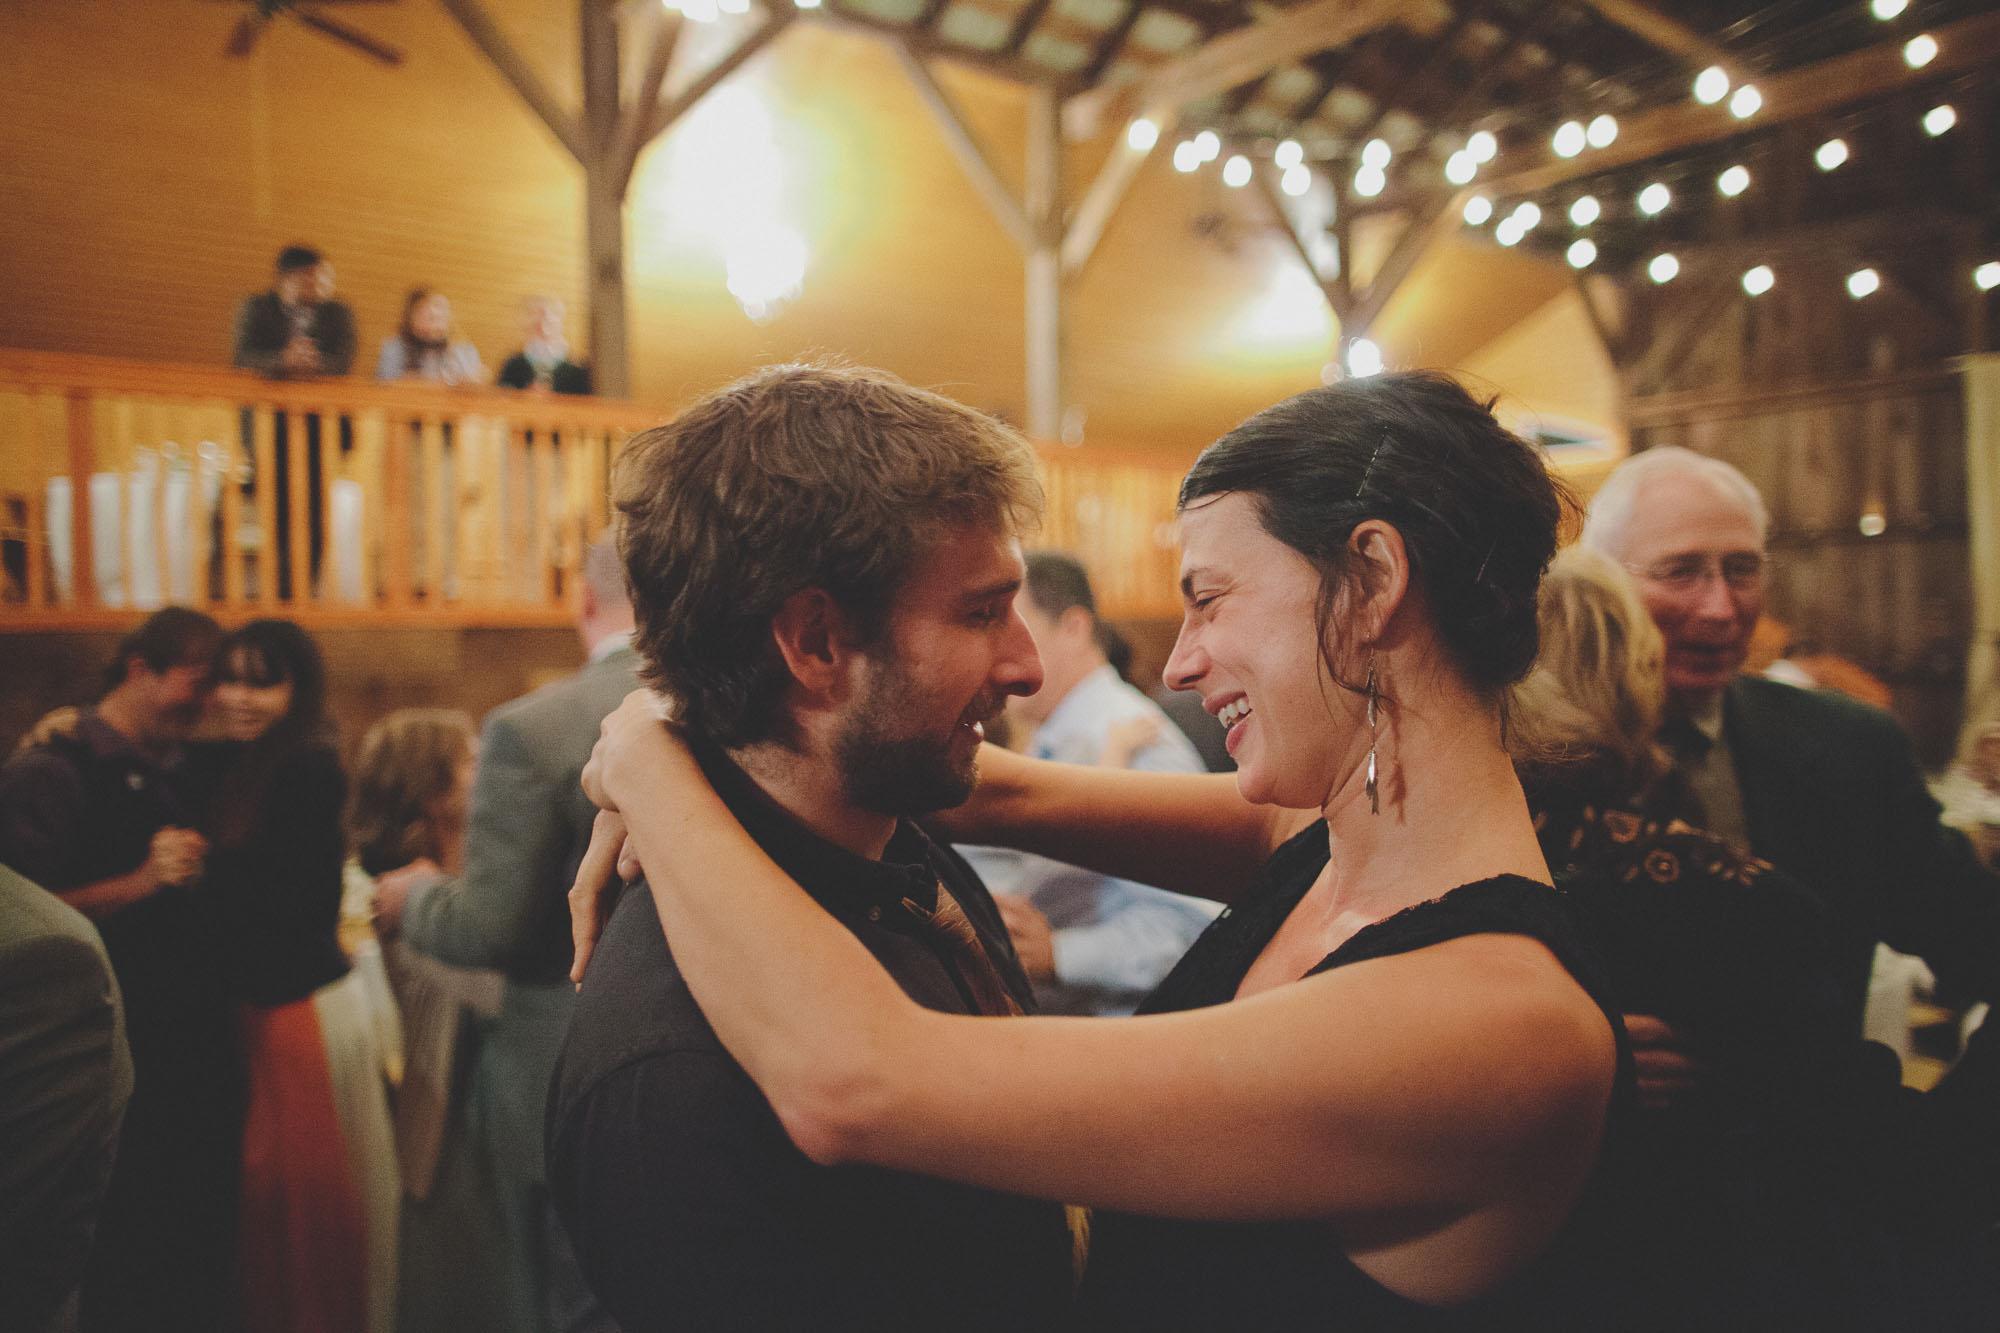 Gretchen_Gause_Petaluma_Olympias_Valley_Wedding_Photo-241.jpg